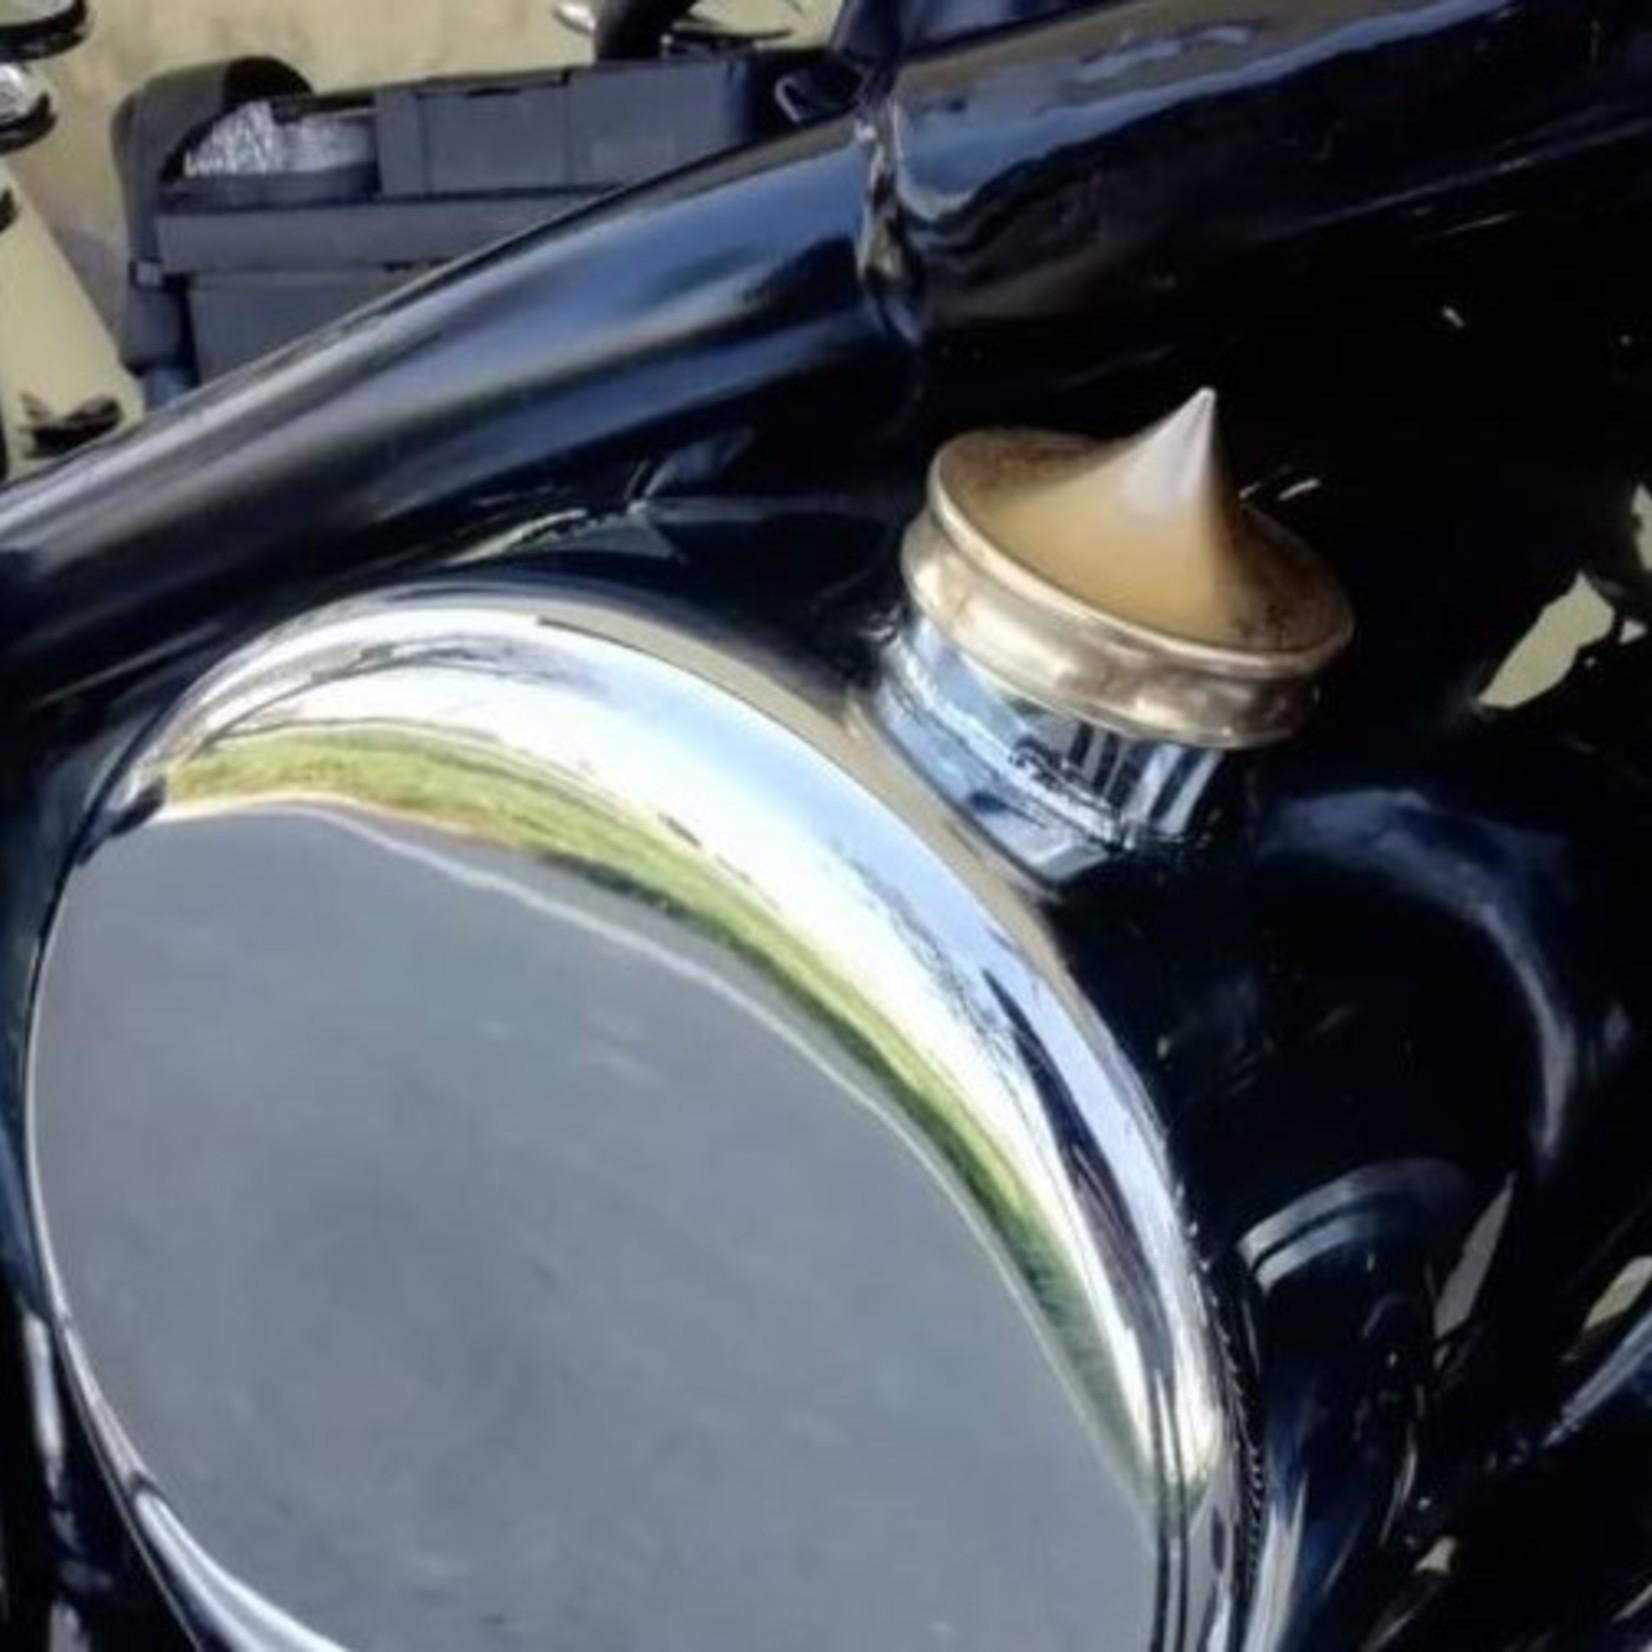 Olie Tankdop - voor Harley Davidson - Messing - Geen peilstok